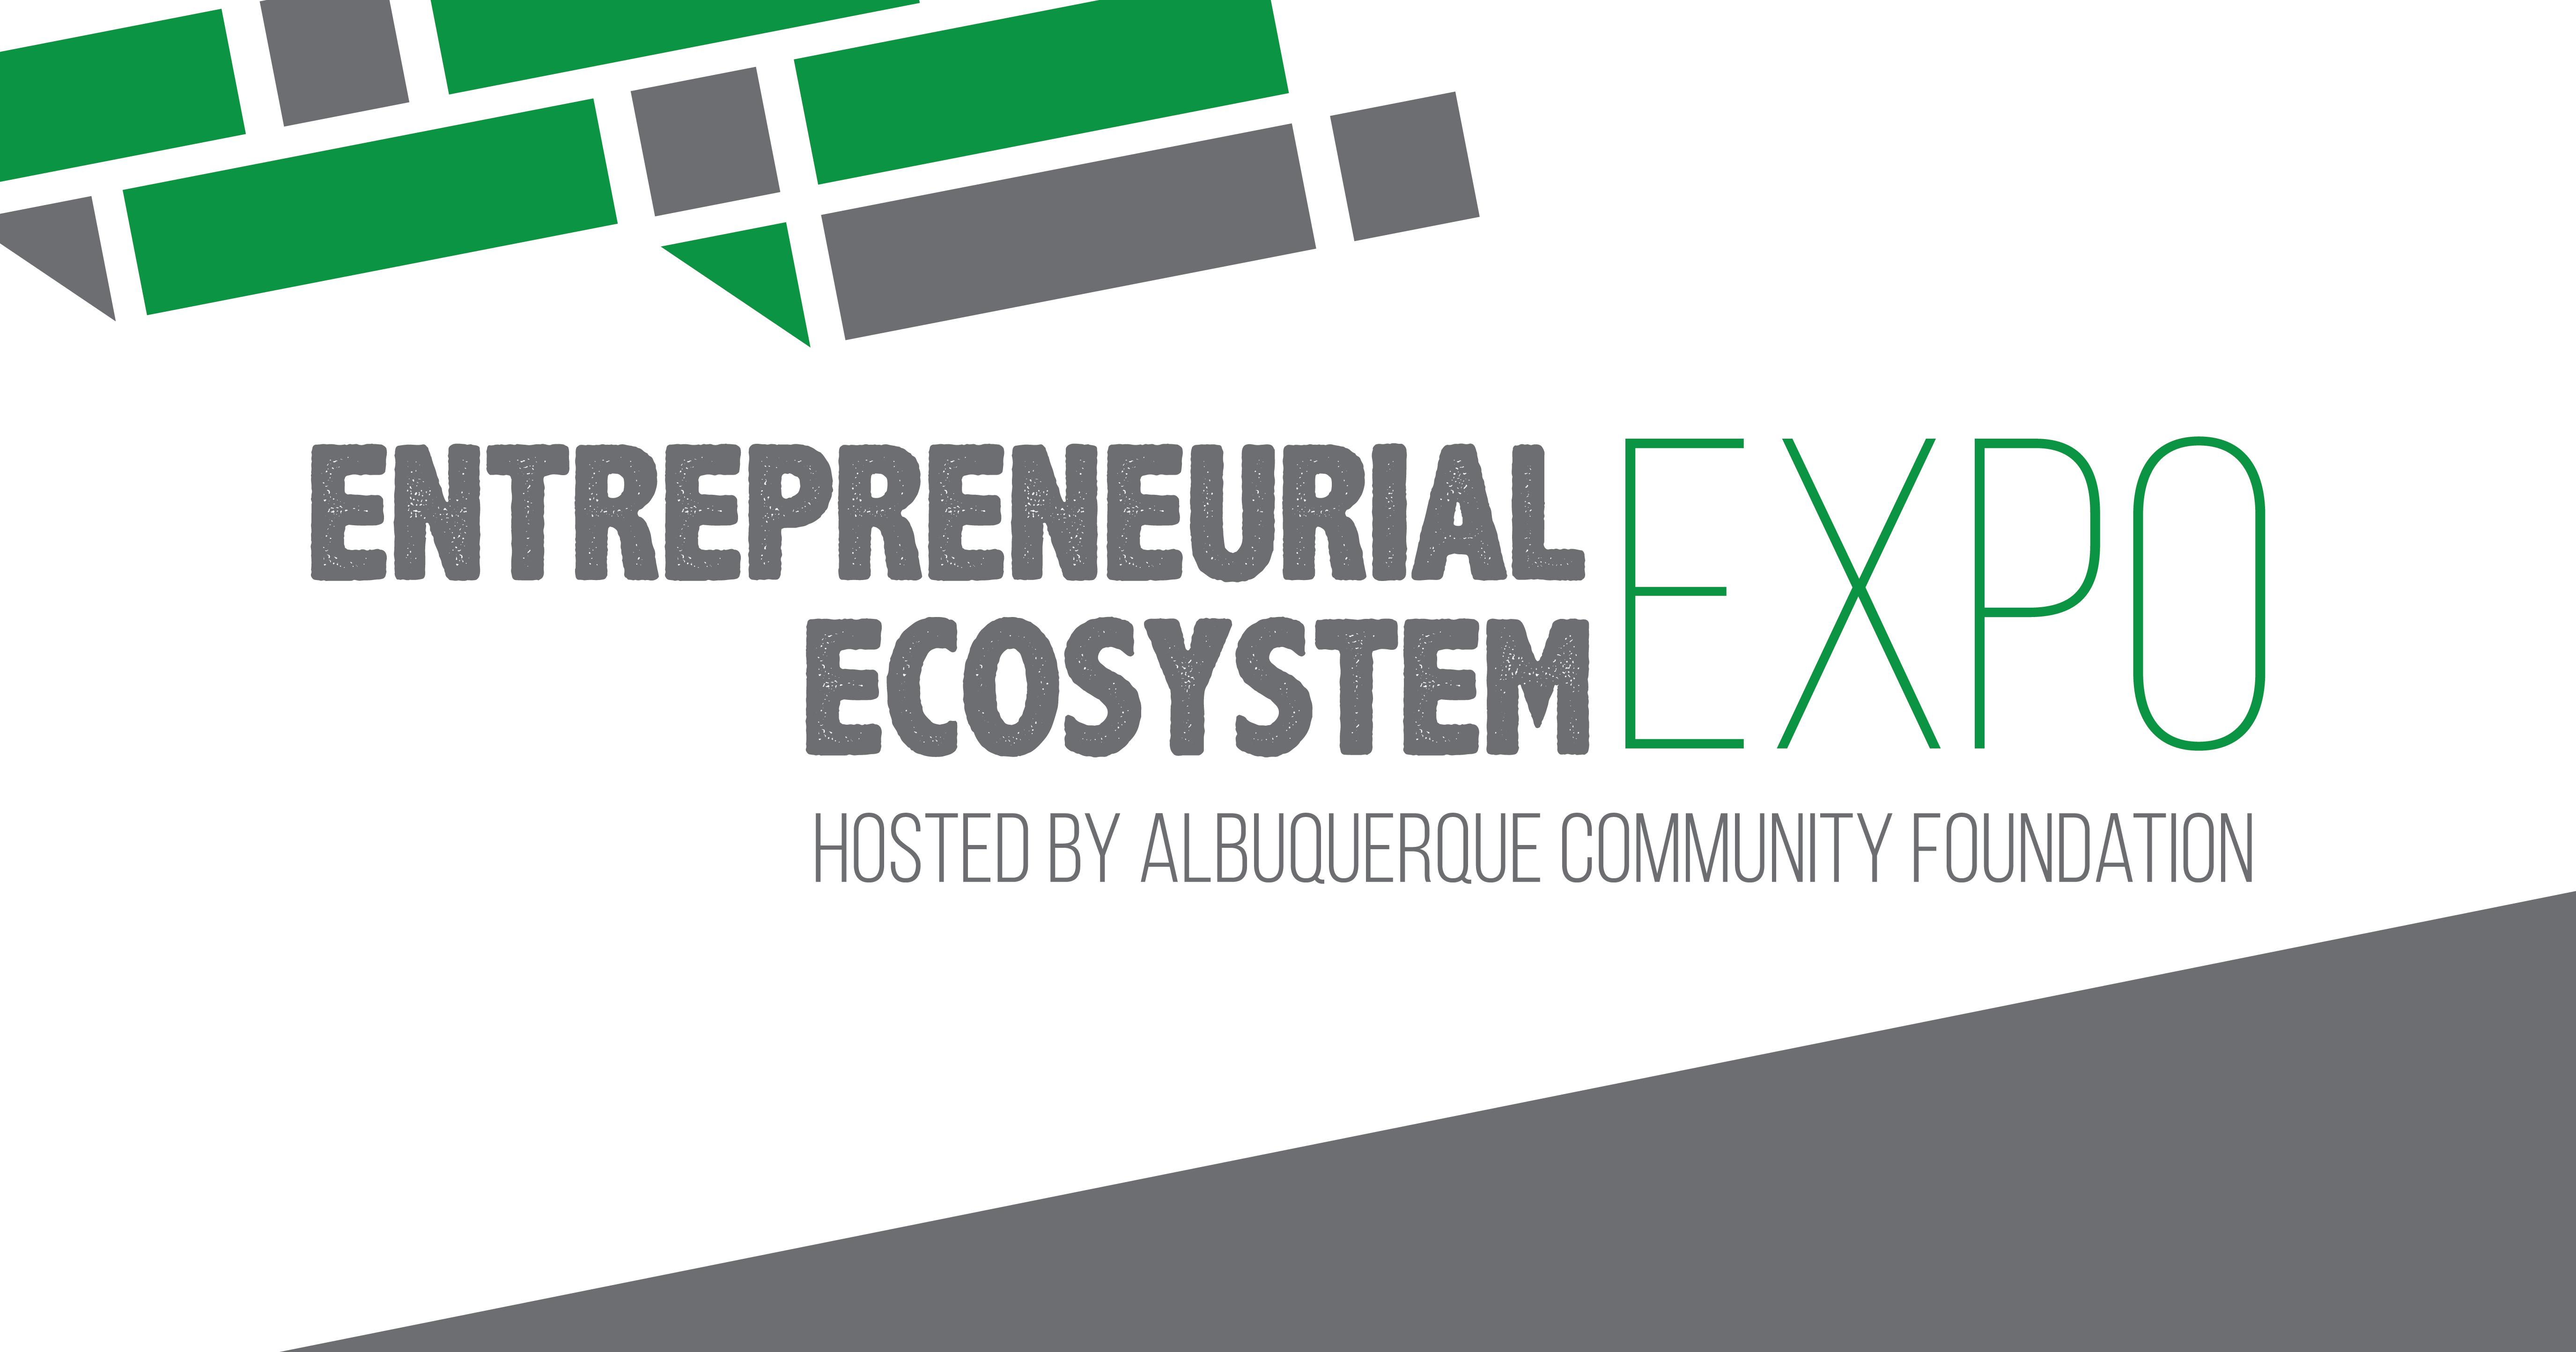 ABQCF logo